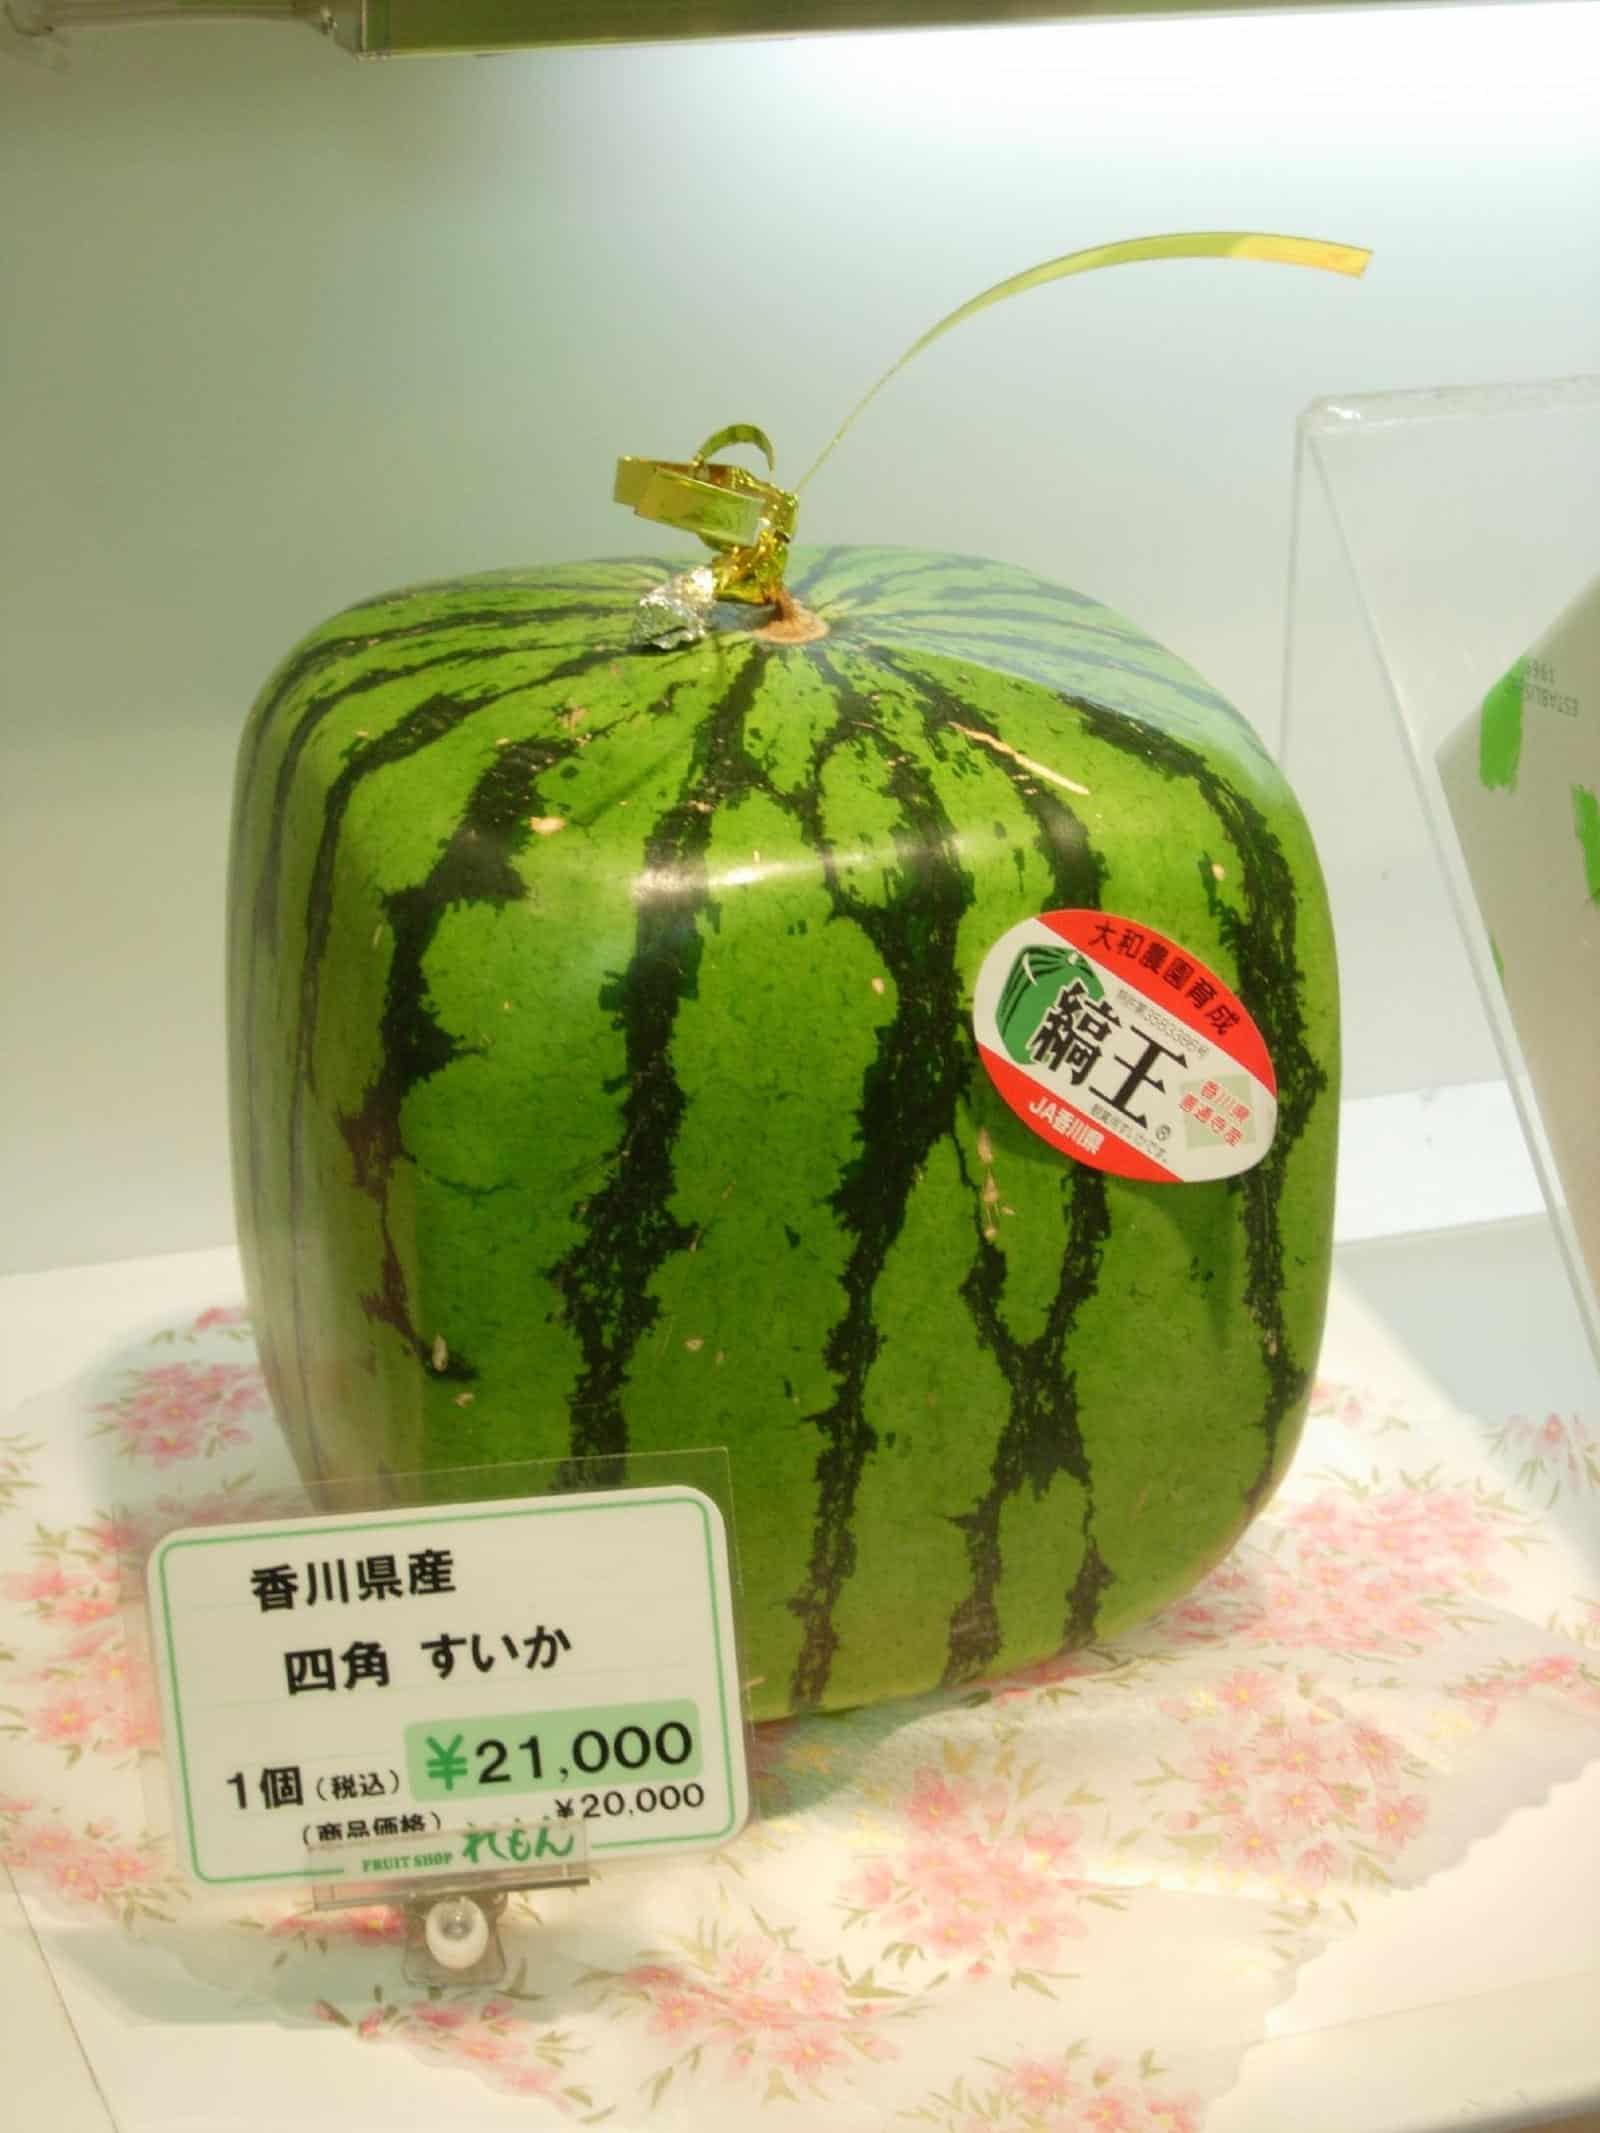 Japan-teuerste-Wassermelone-quadratisch-rechteckig